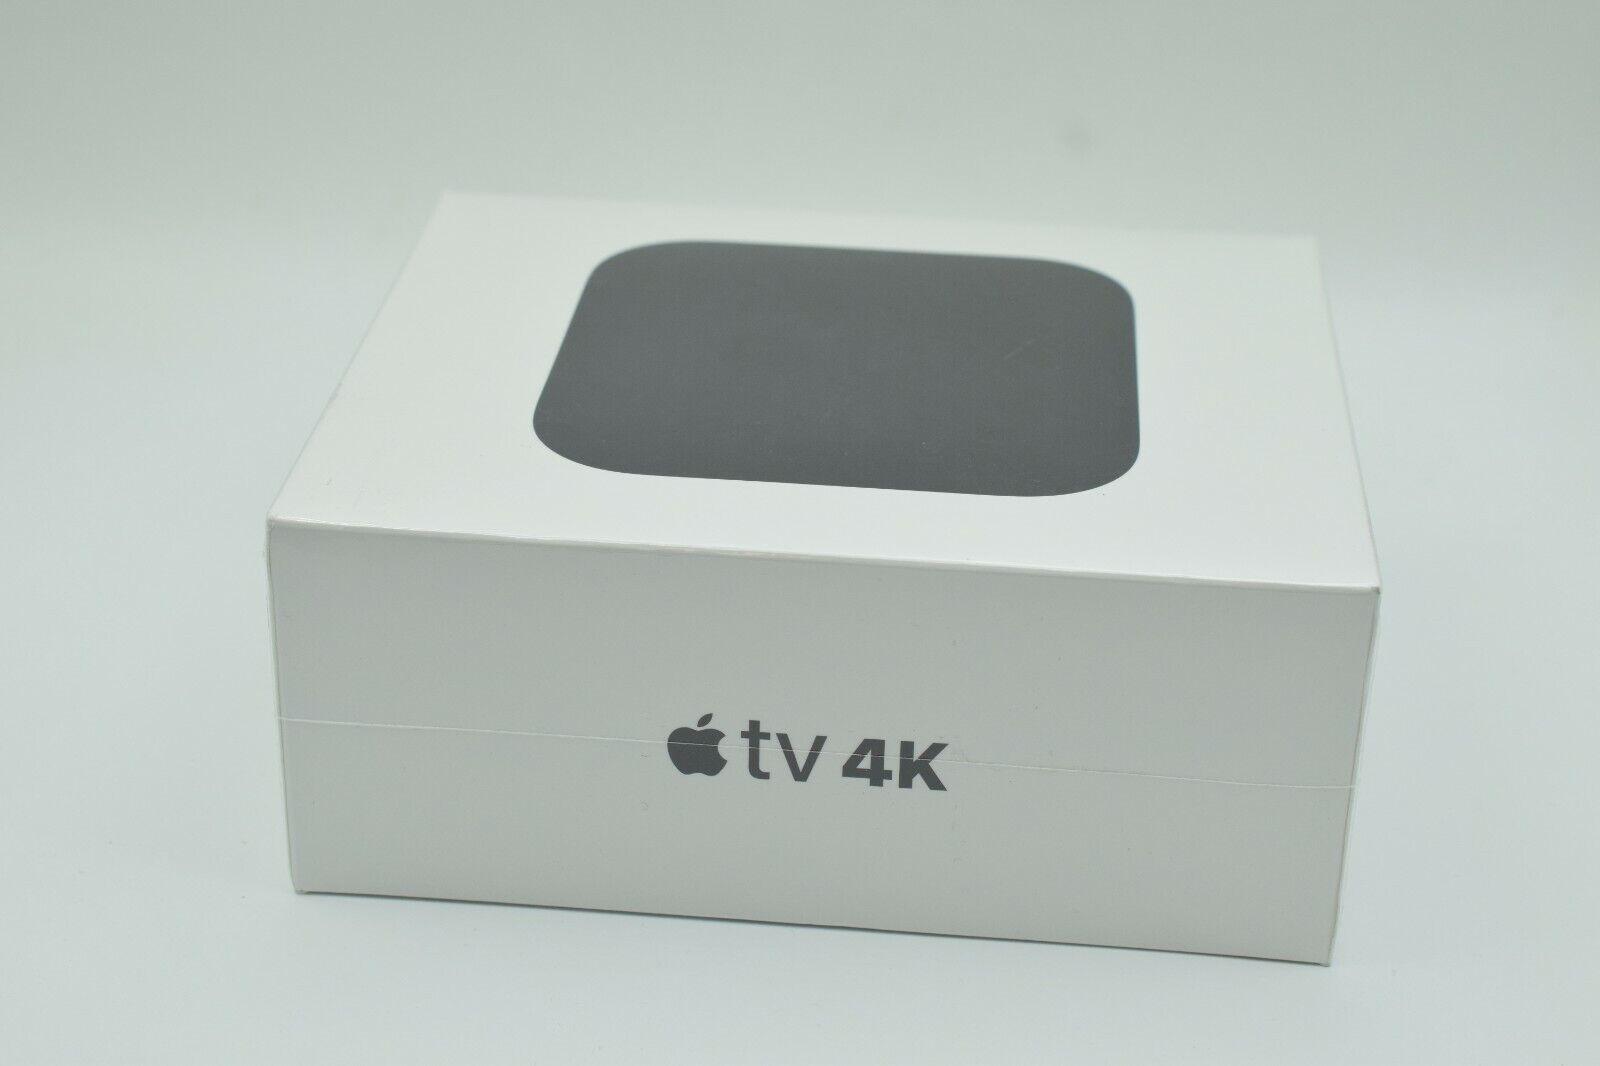 Apple Apple TV 4K 32GB (latest model) Black MQD22LL/A